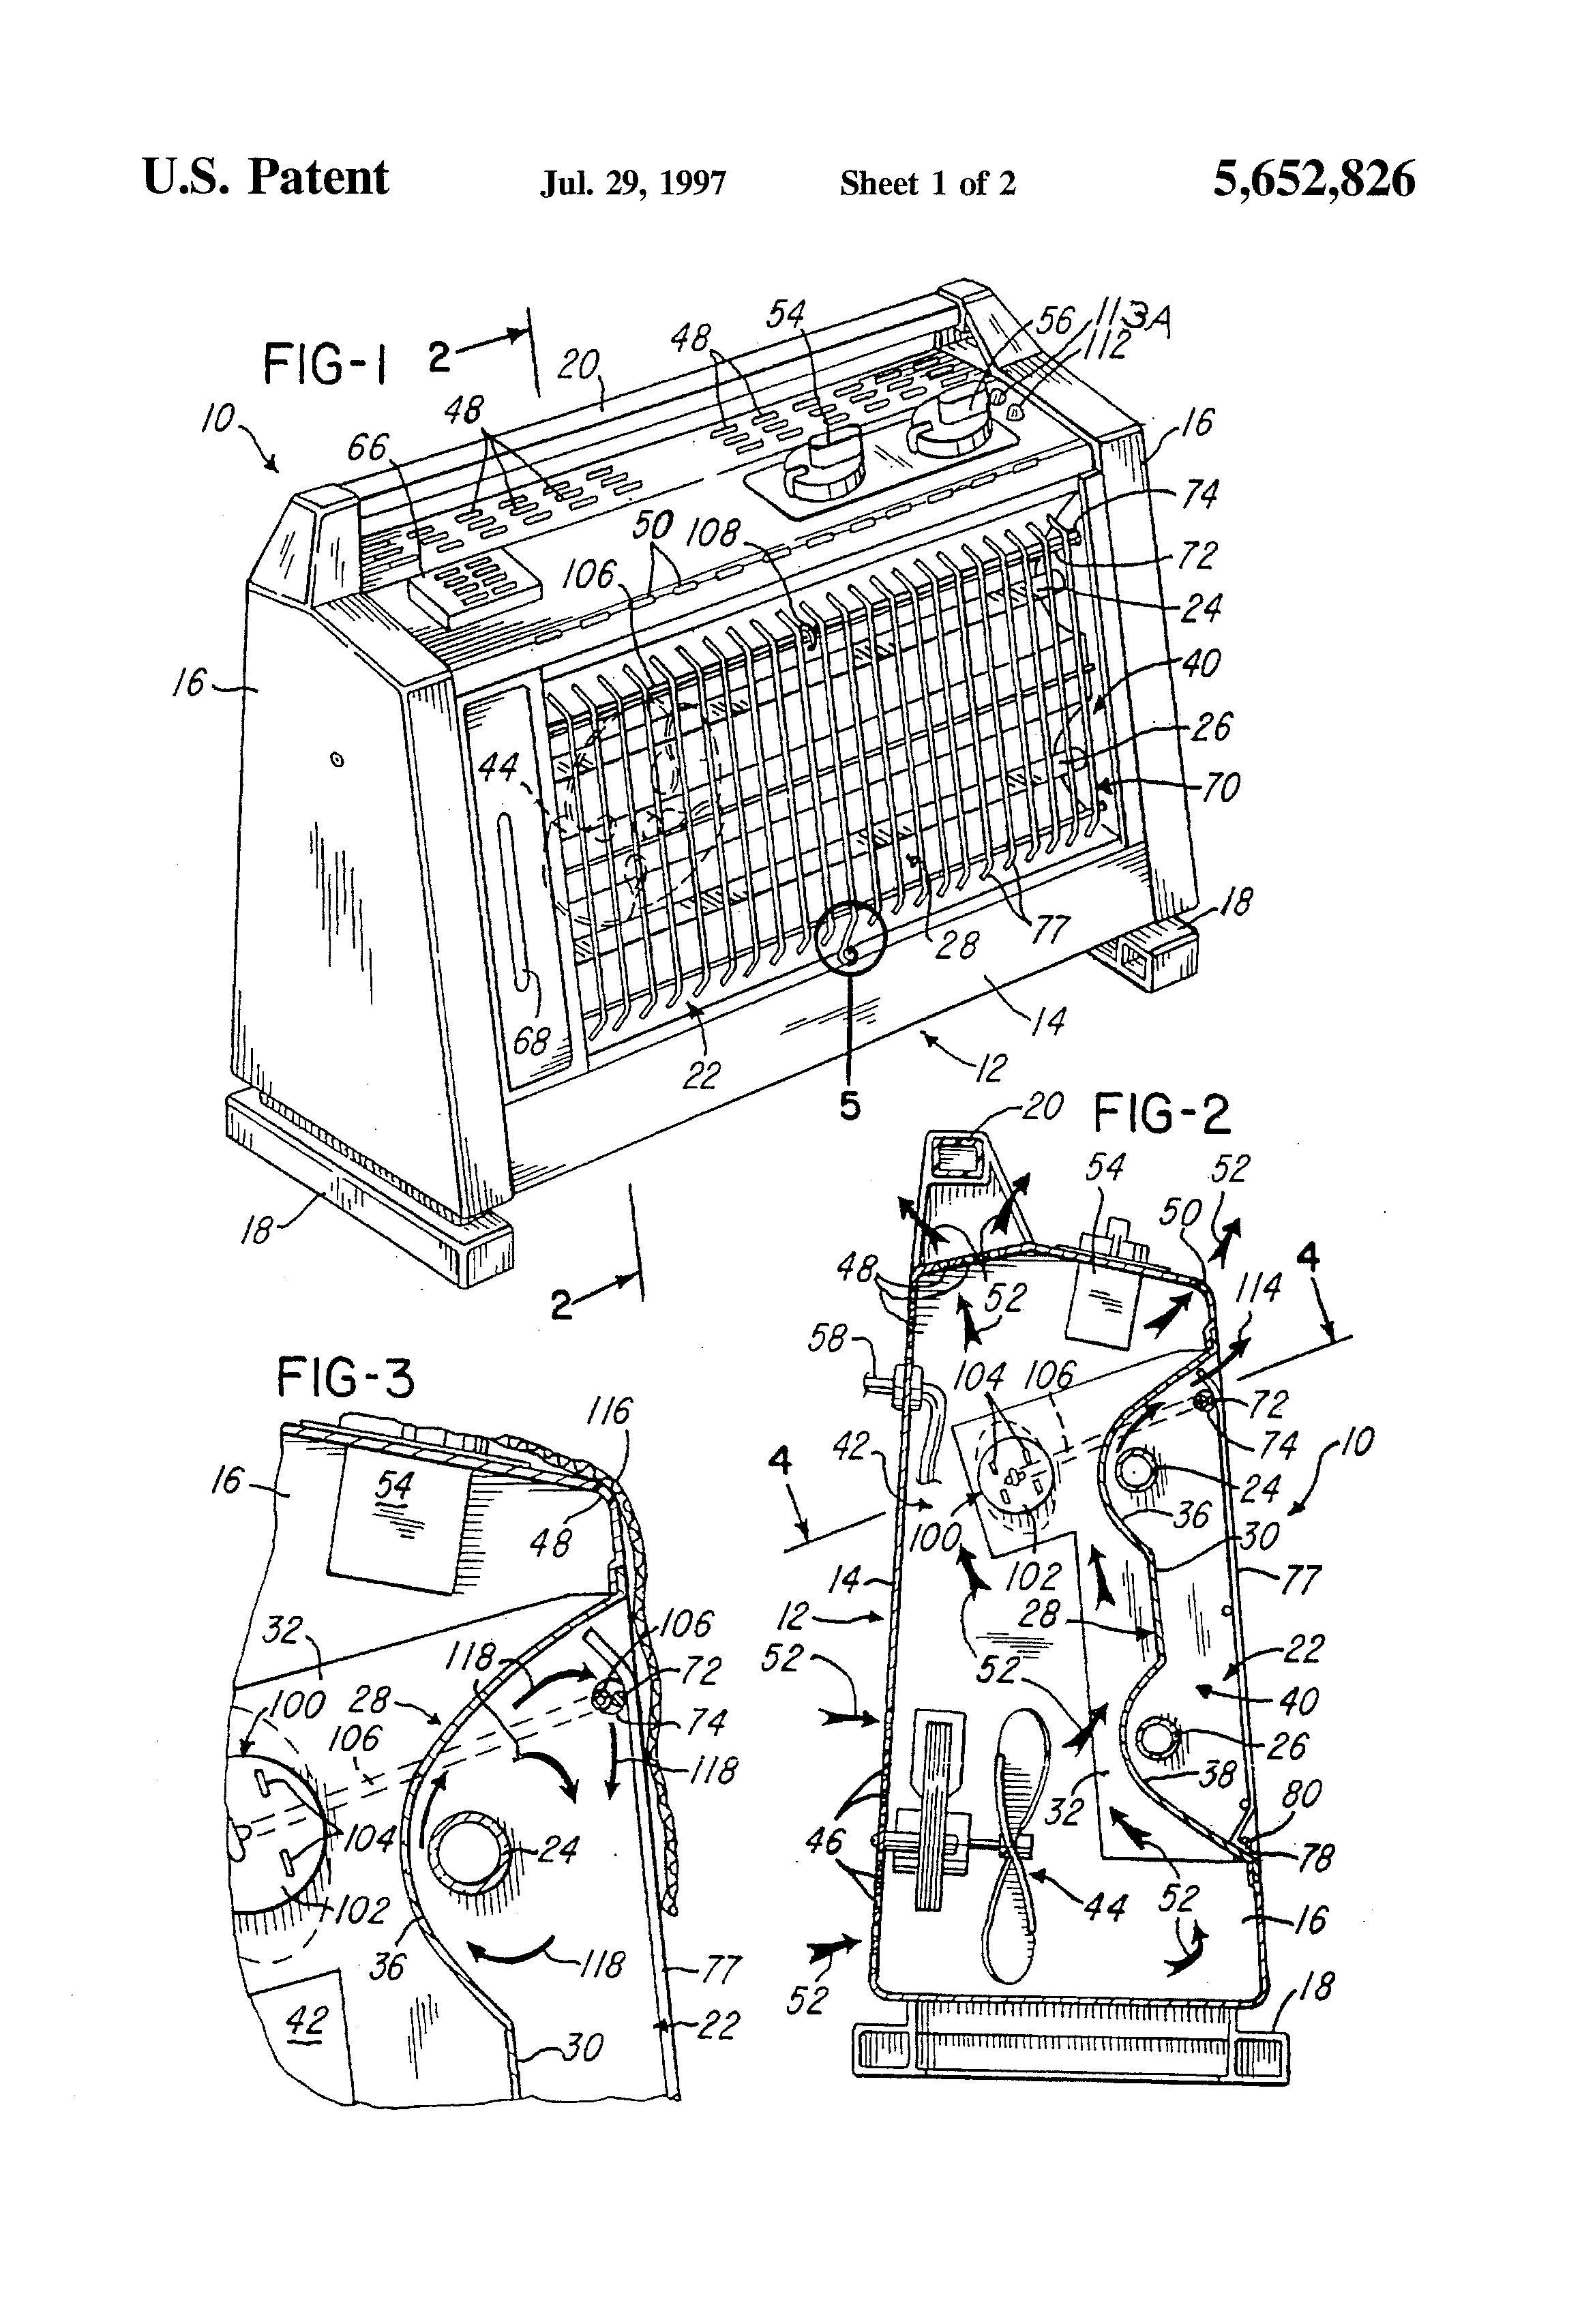 New Wiring Diagram Cadet Baseboard Heater Baseboard Heater Diagram Heater